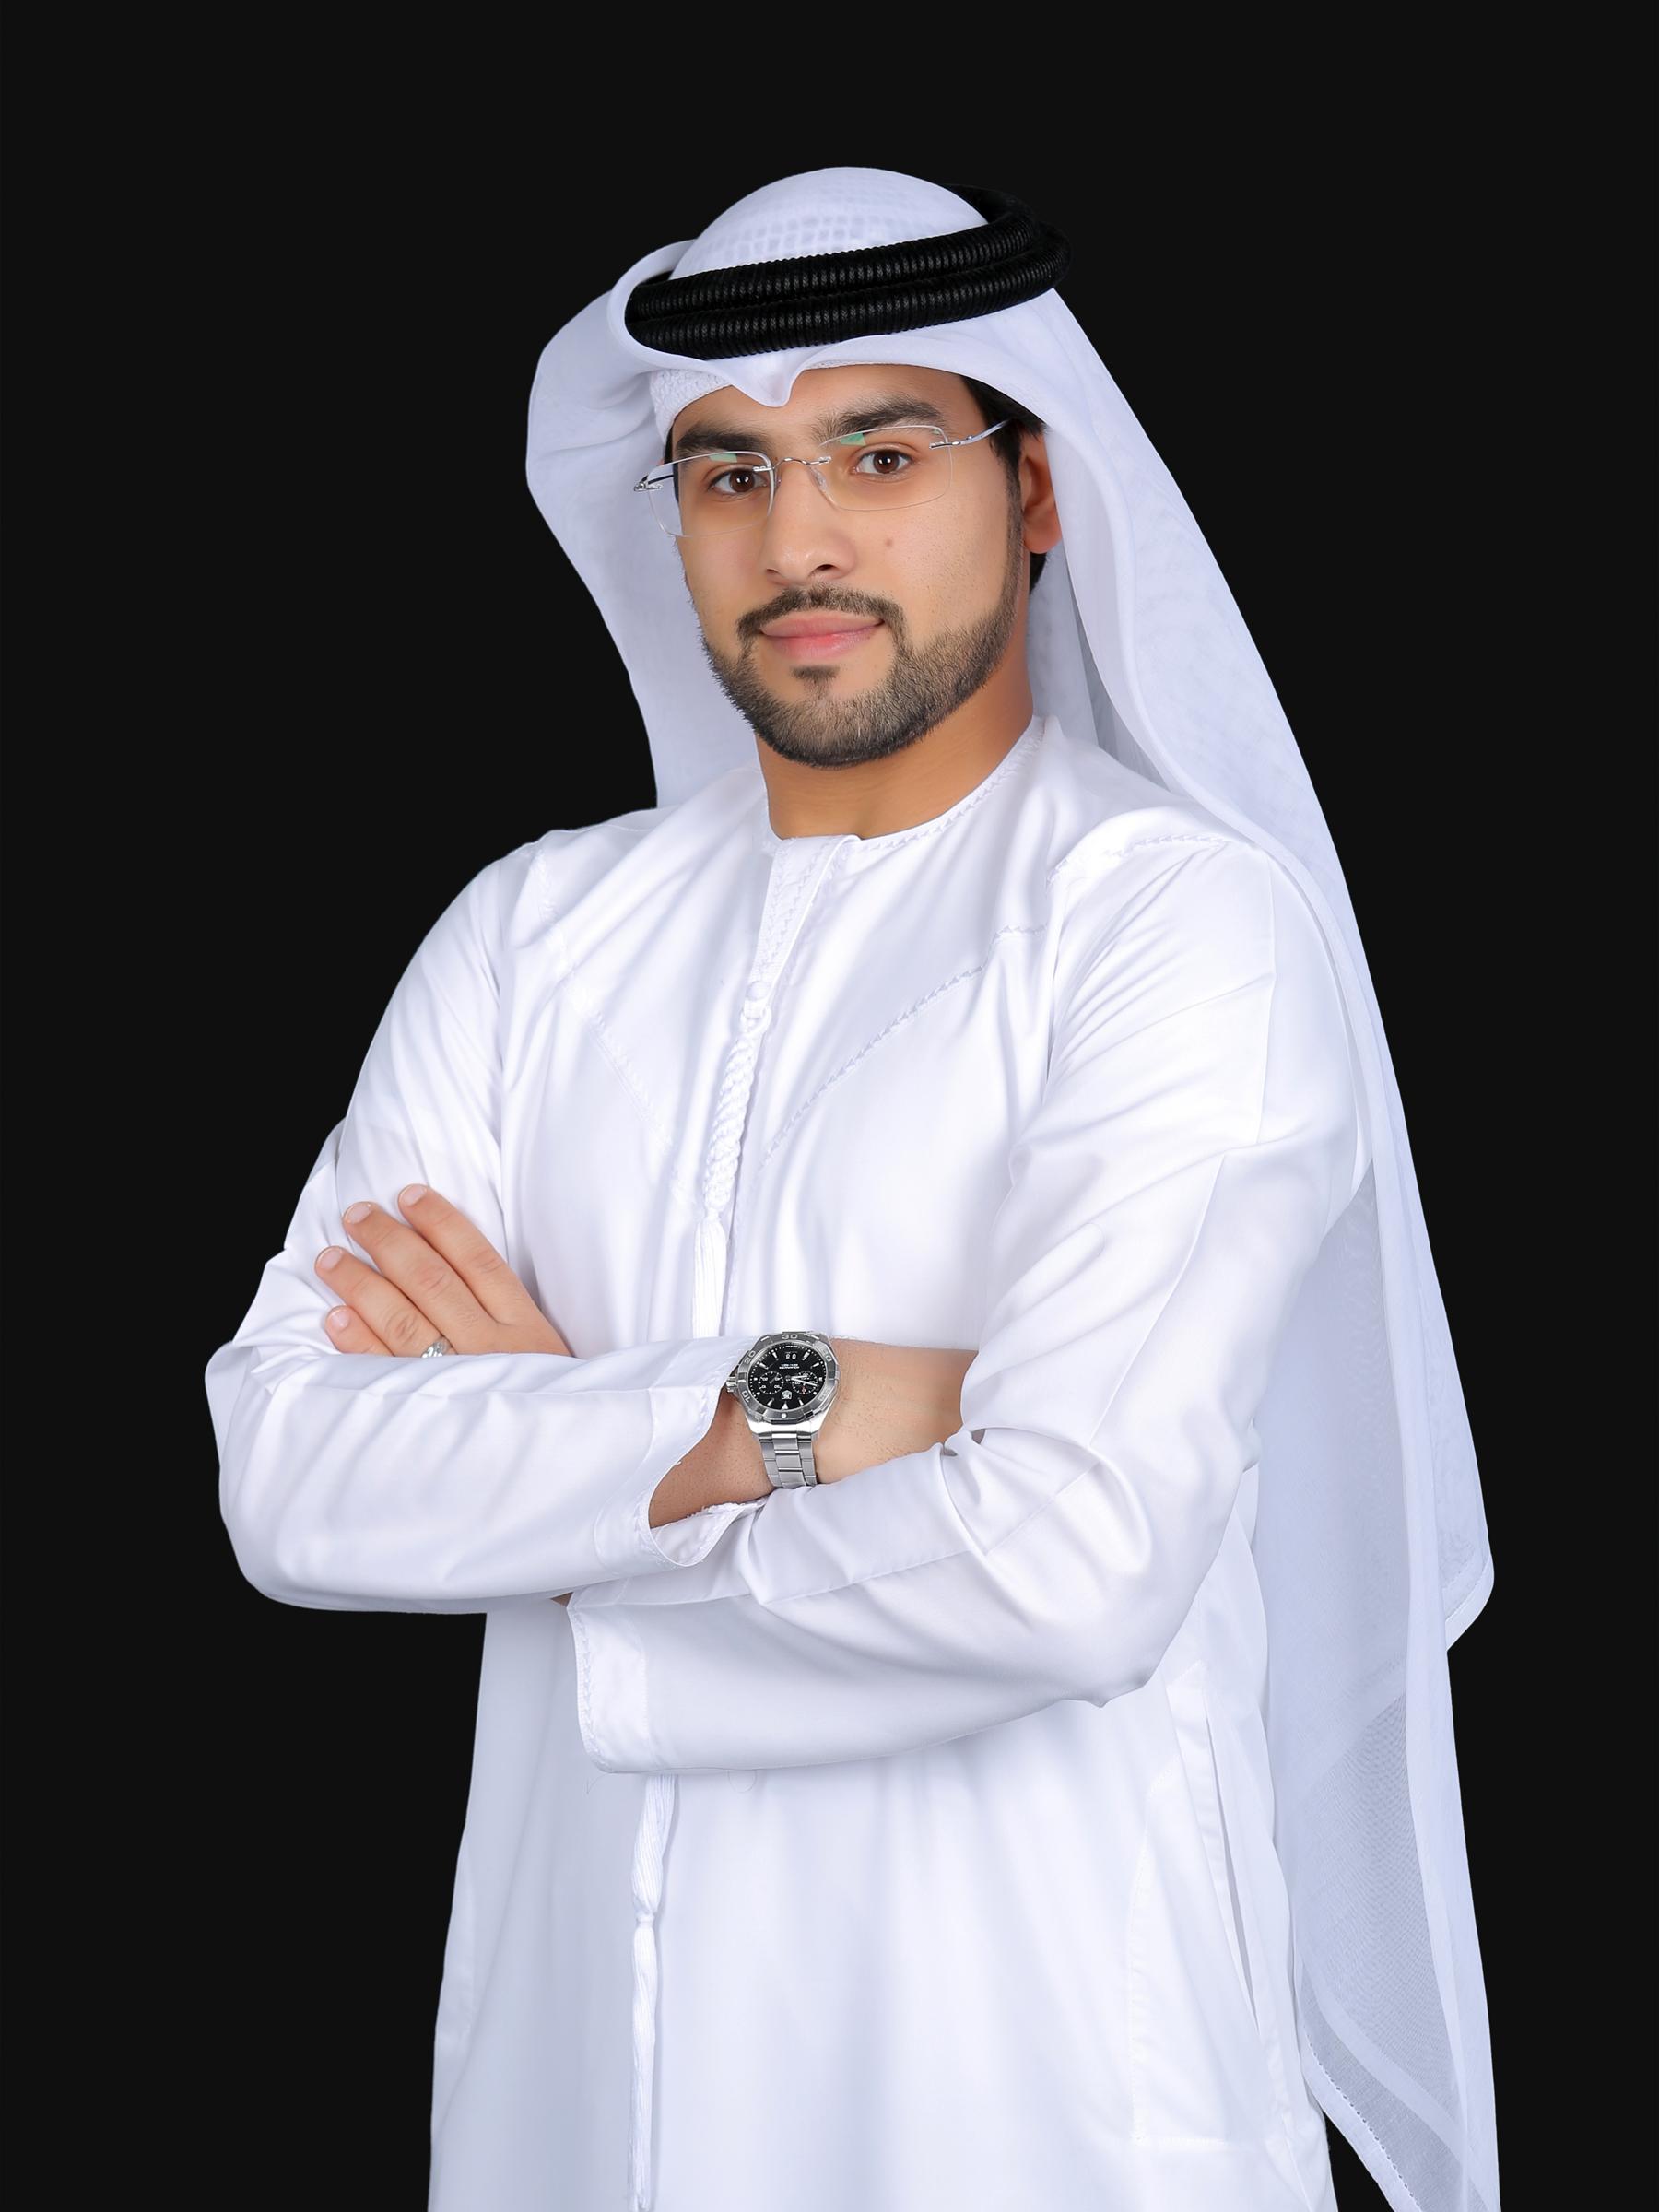 Abdulla Kazim Nuaimi